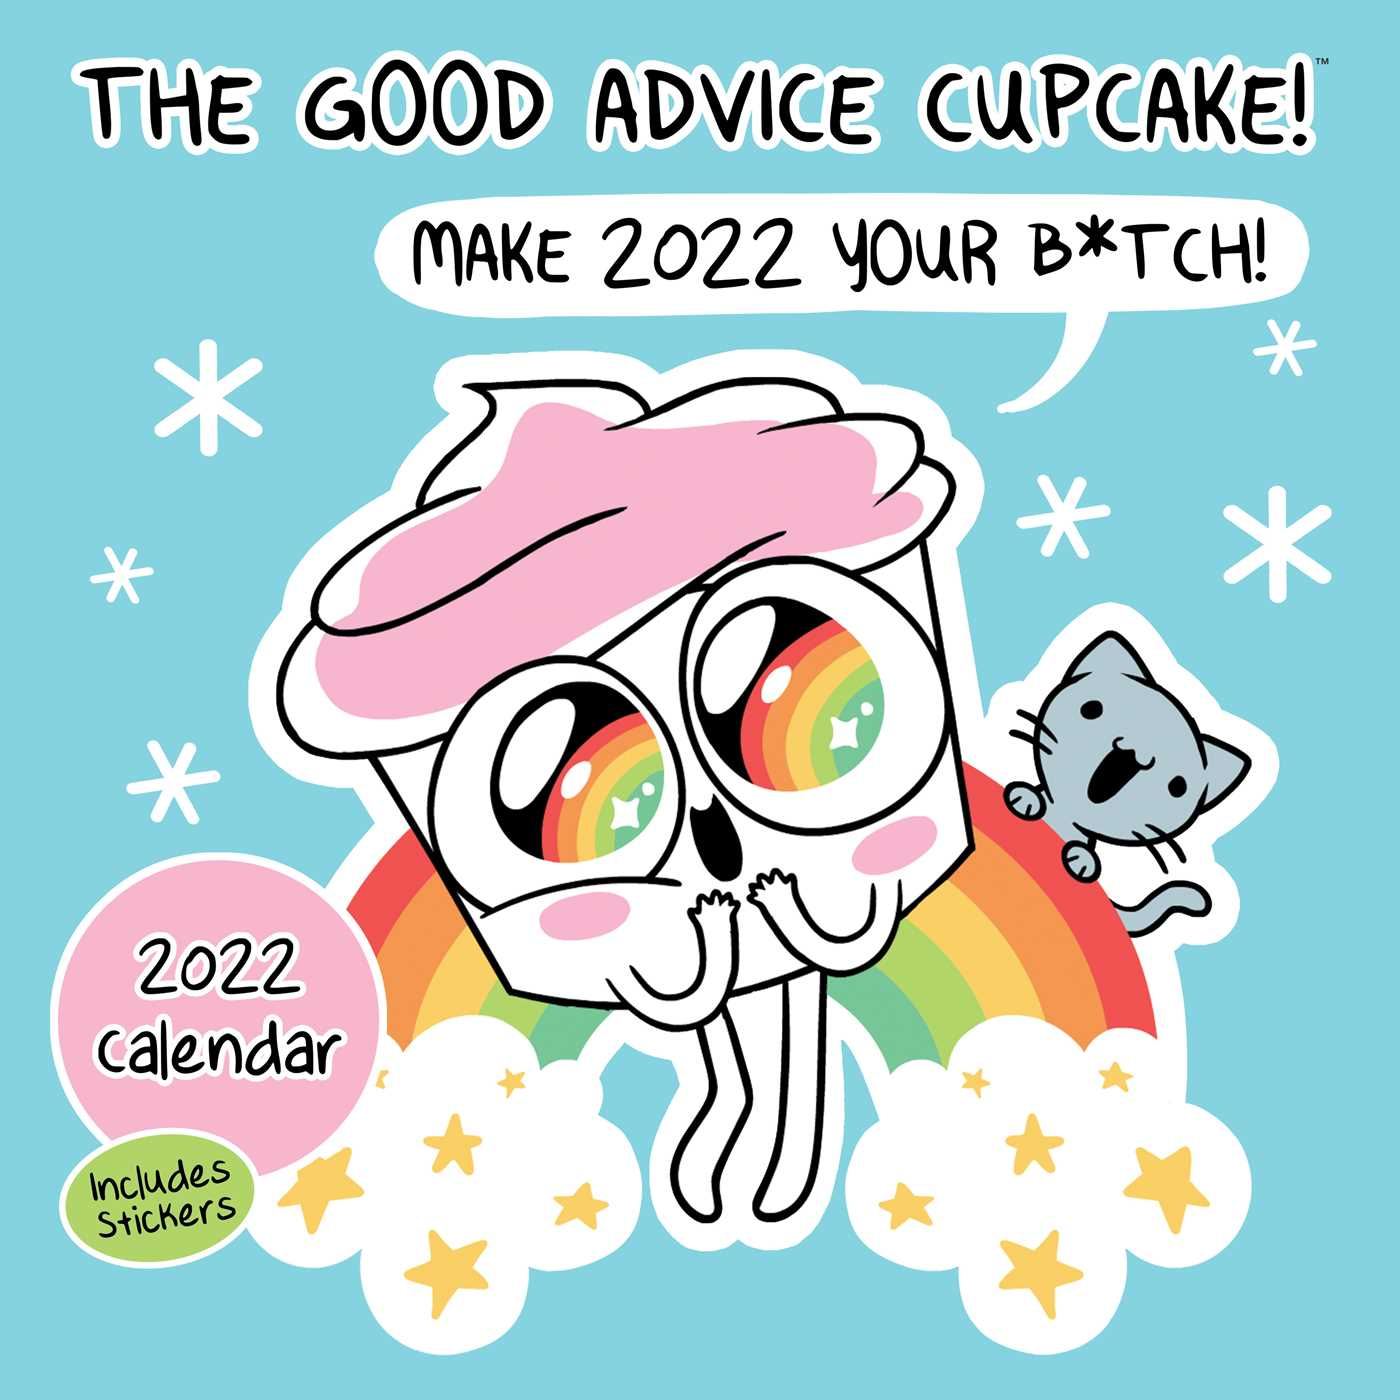 Uofa Calendar 2022.Good Advice Cupcake 2022 Wall Calendar Book Summary Video Official Publisher Page Simon Schuster Canada